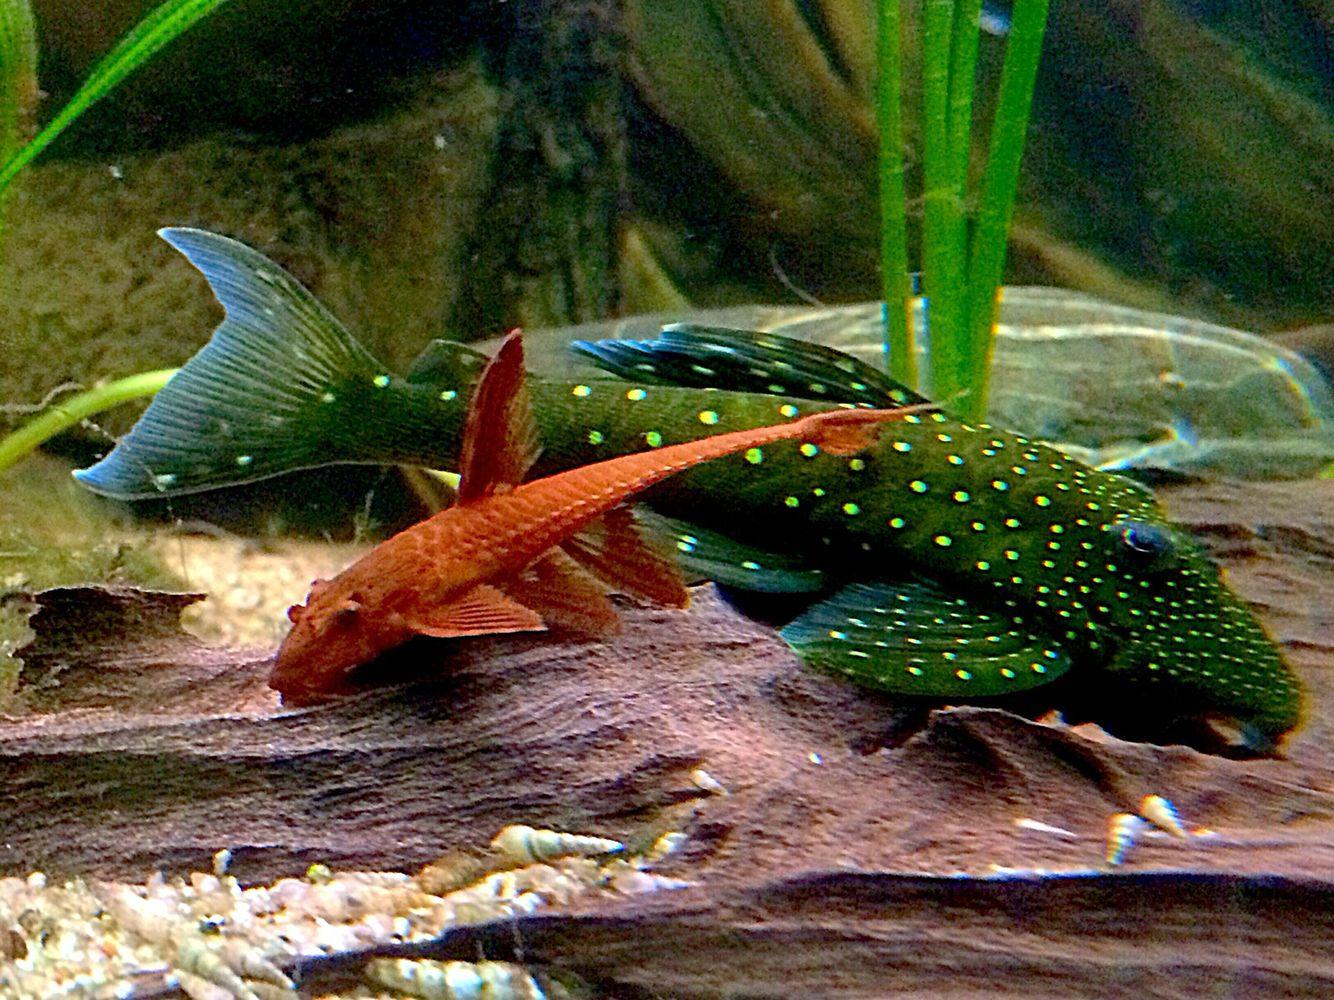 Freshwater aquarium fish capacity - Freshwater Aquariumaquarium Fishcatfishfresh Water Farlowella Acus L10a L 128